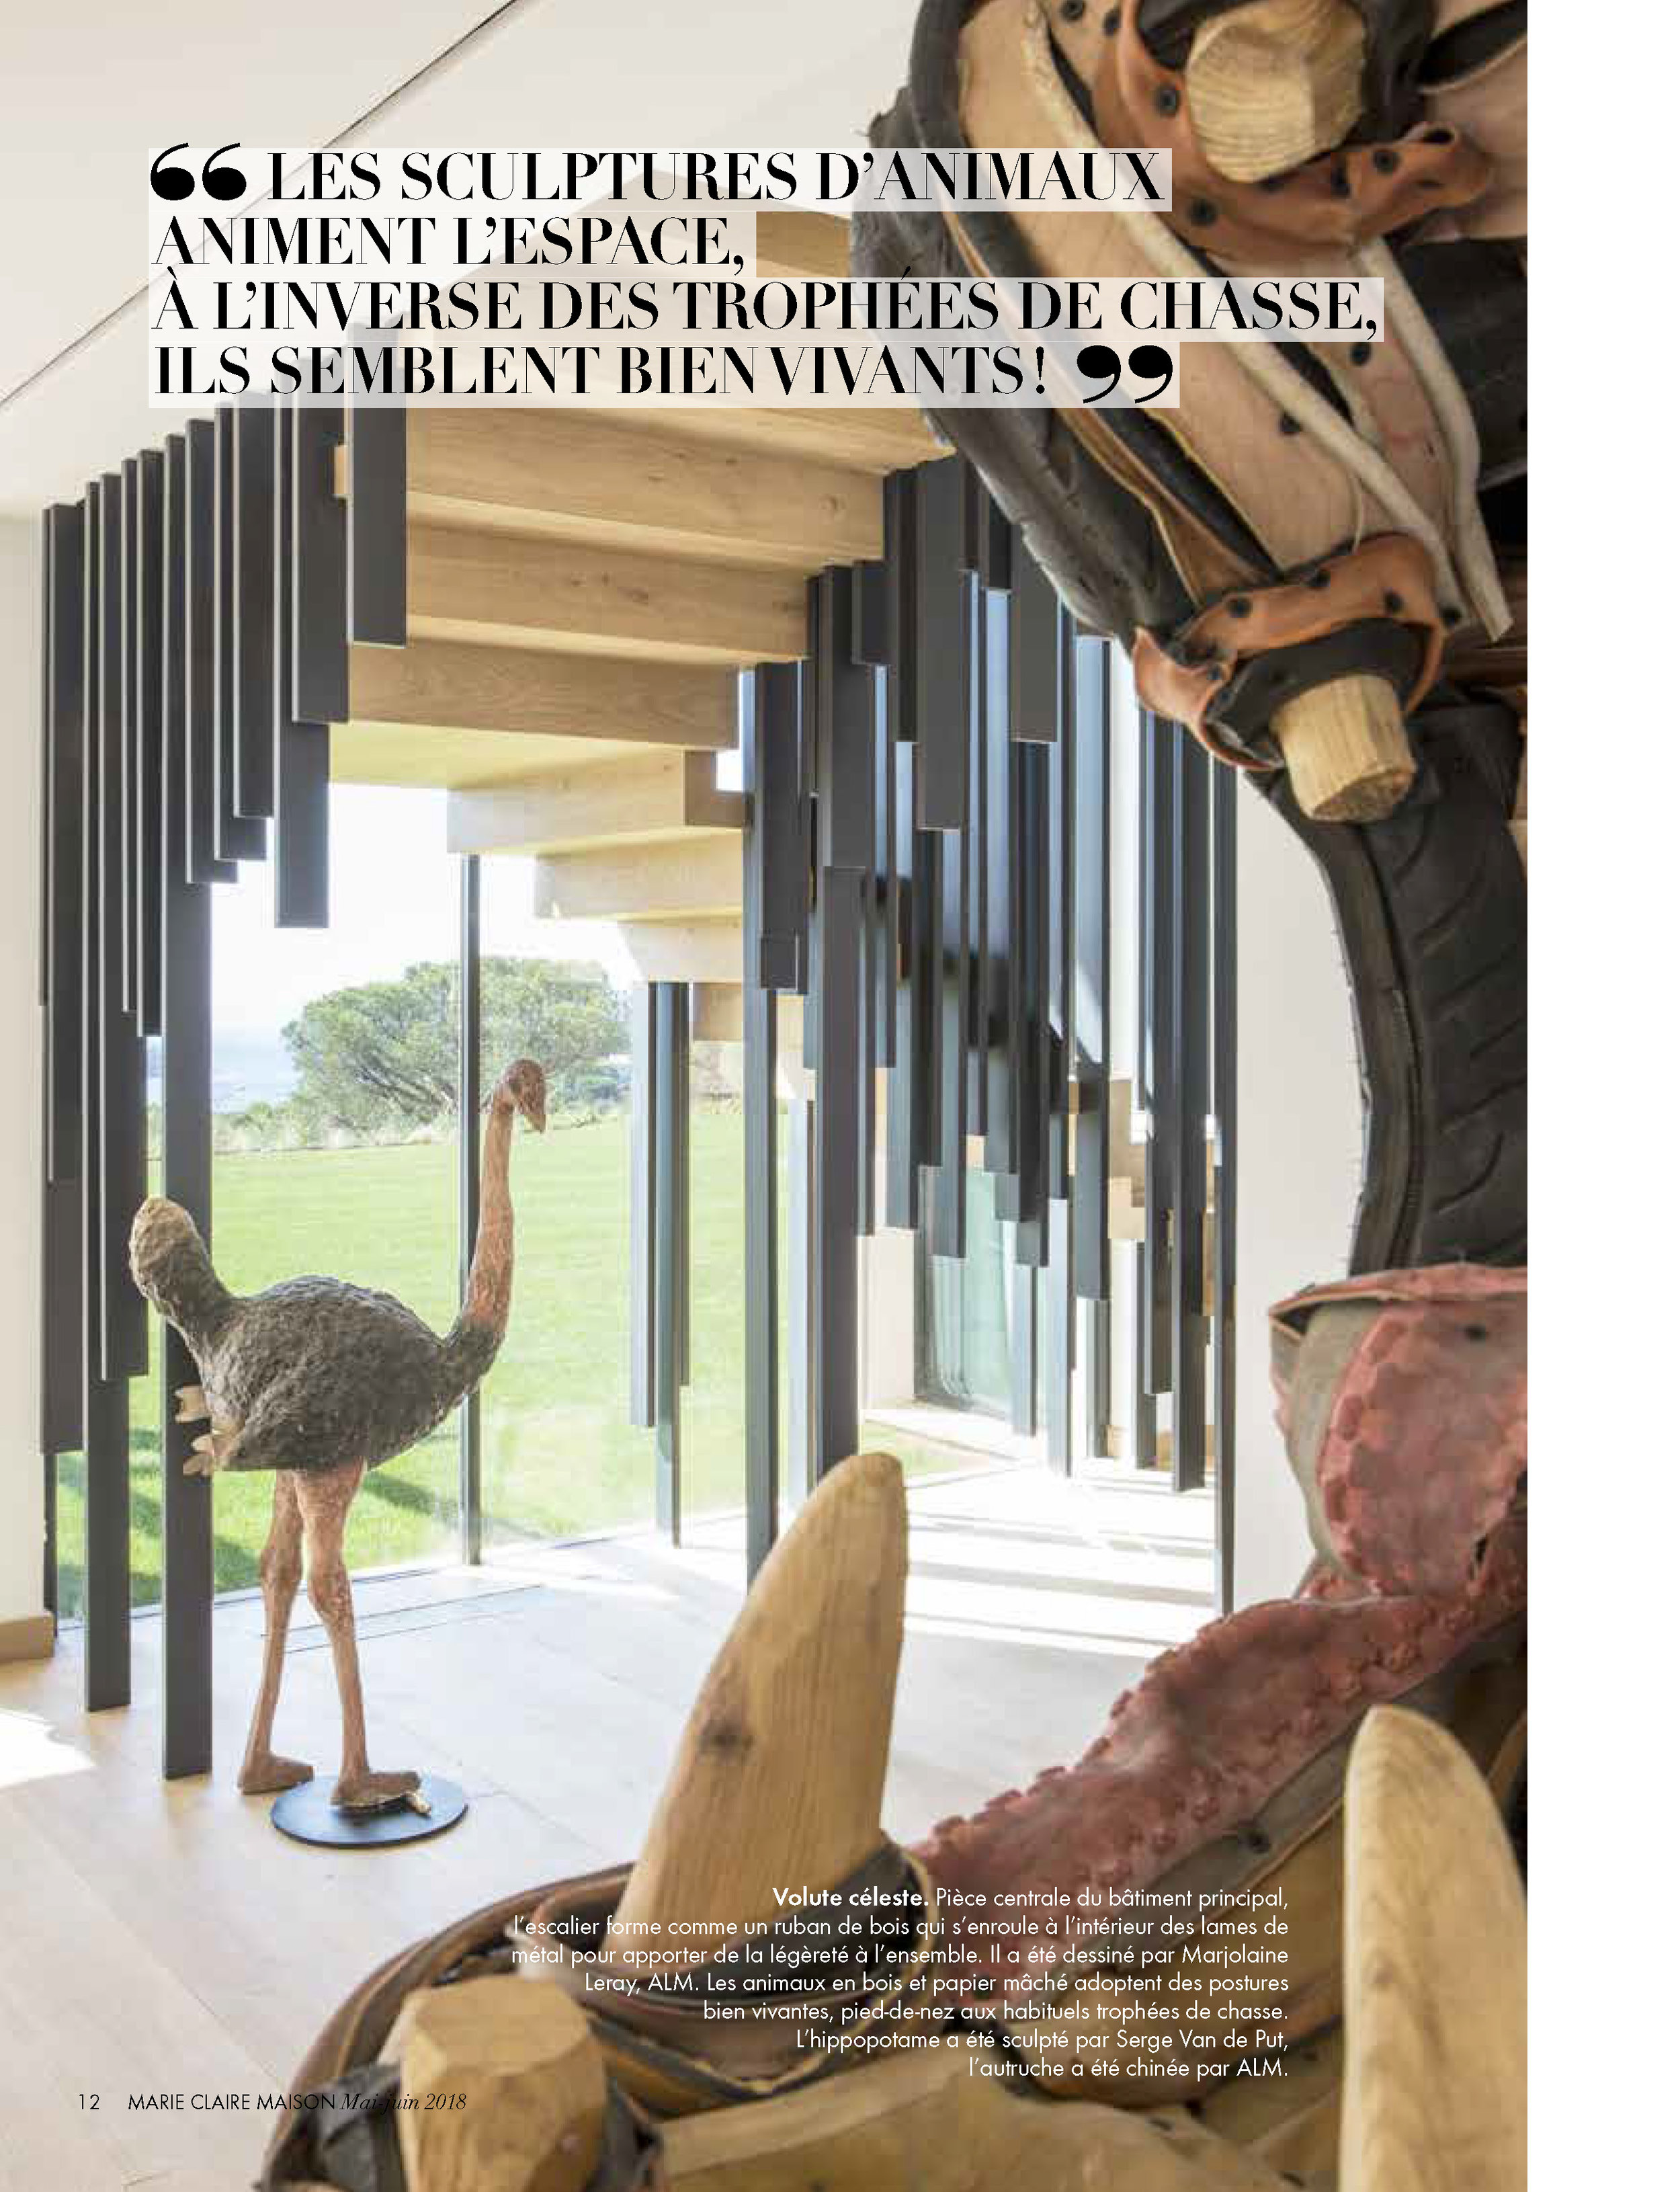 MARIE CLAIRE Report_Ramatuelle[2] copy 11.jpg